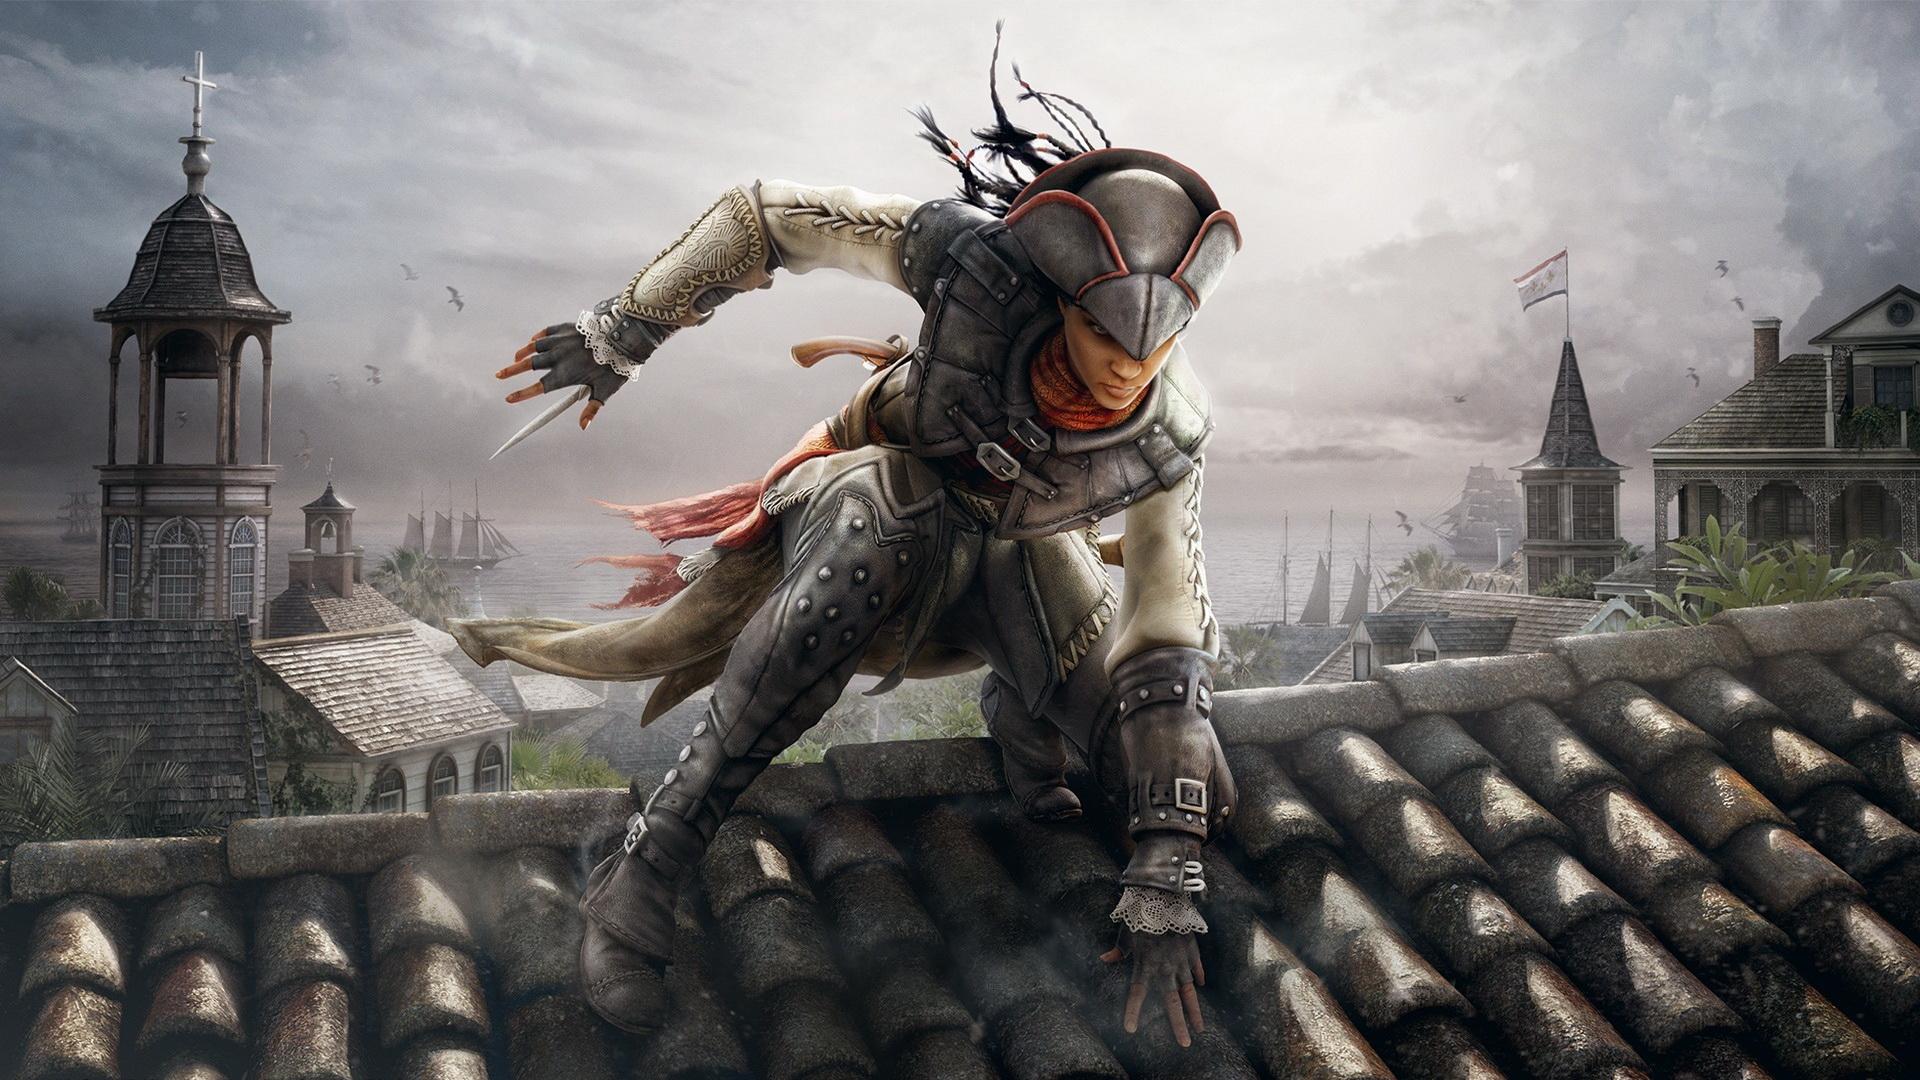 Assassins Creed 3 Liberation WALLPAPER 1920x1080